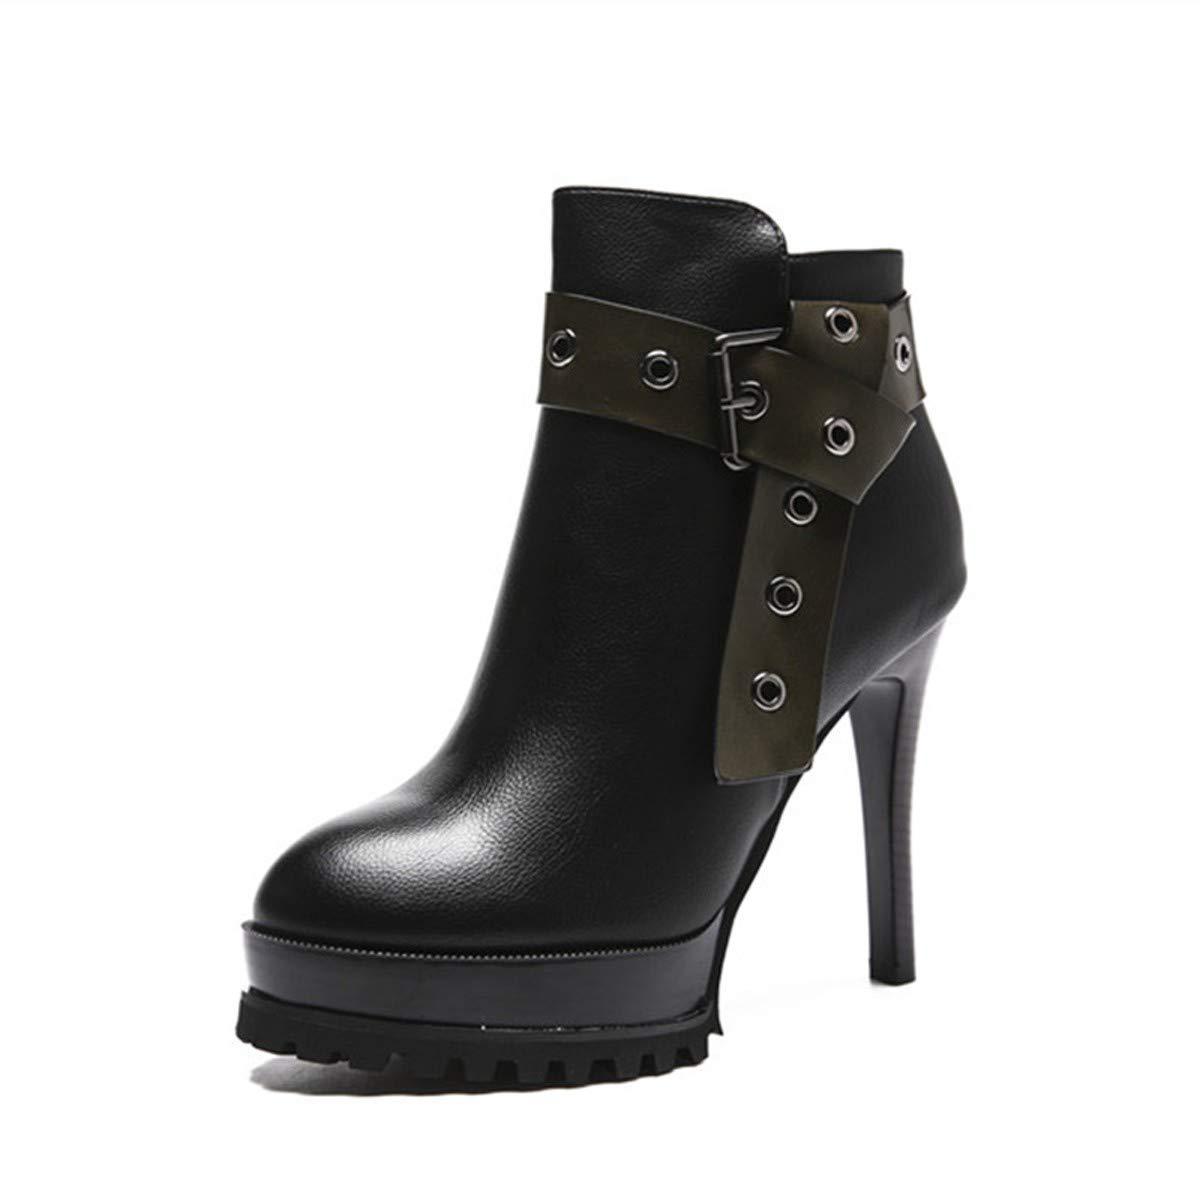 LBTSQ-Martin Stiefel Damenschuhe Schnalle 12Cm Wasserdichte Plattform Hochhackige Schuhe Kurze Stiefel Dünn Schuhe Mode.